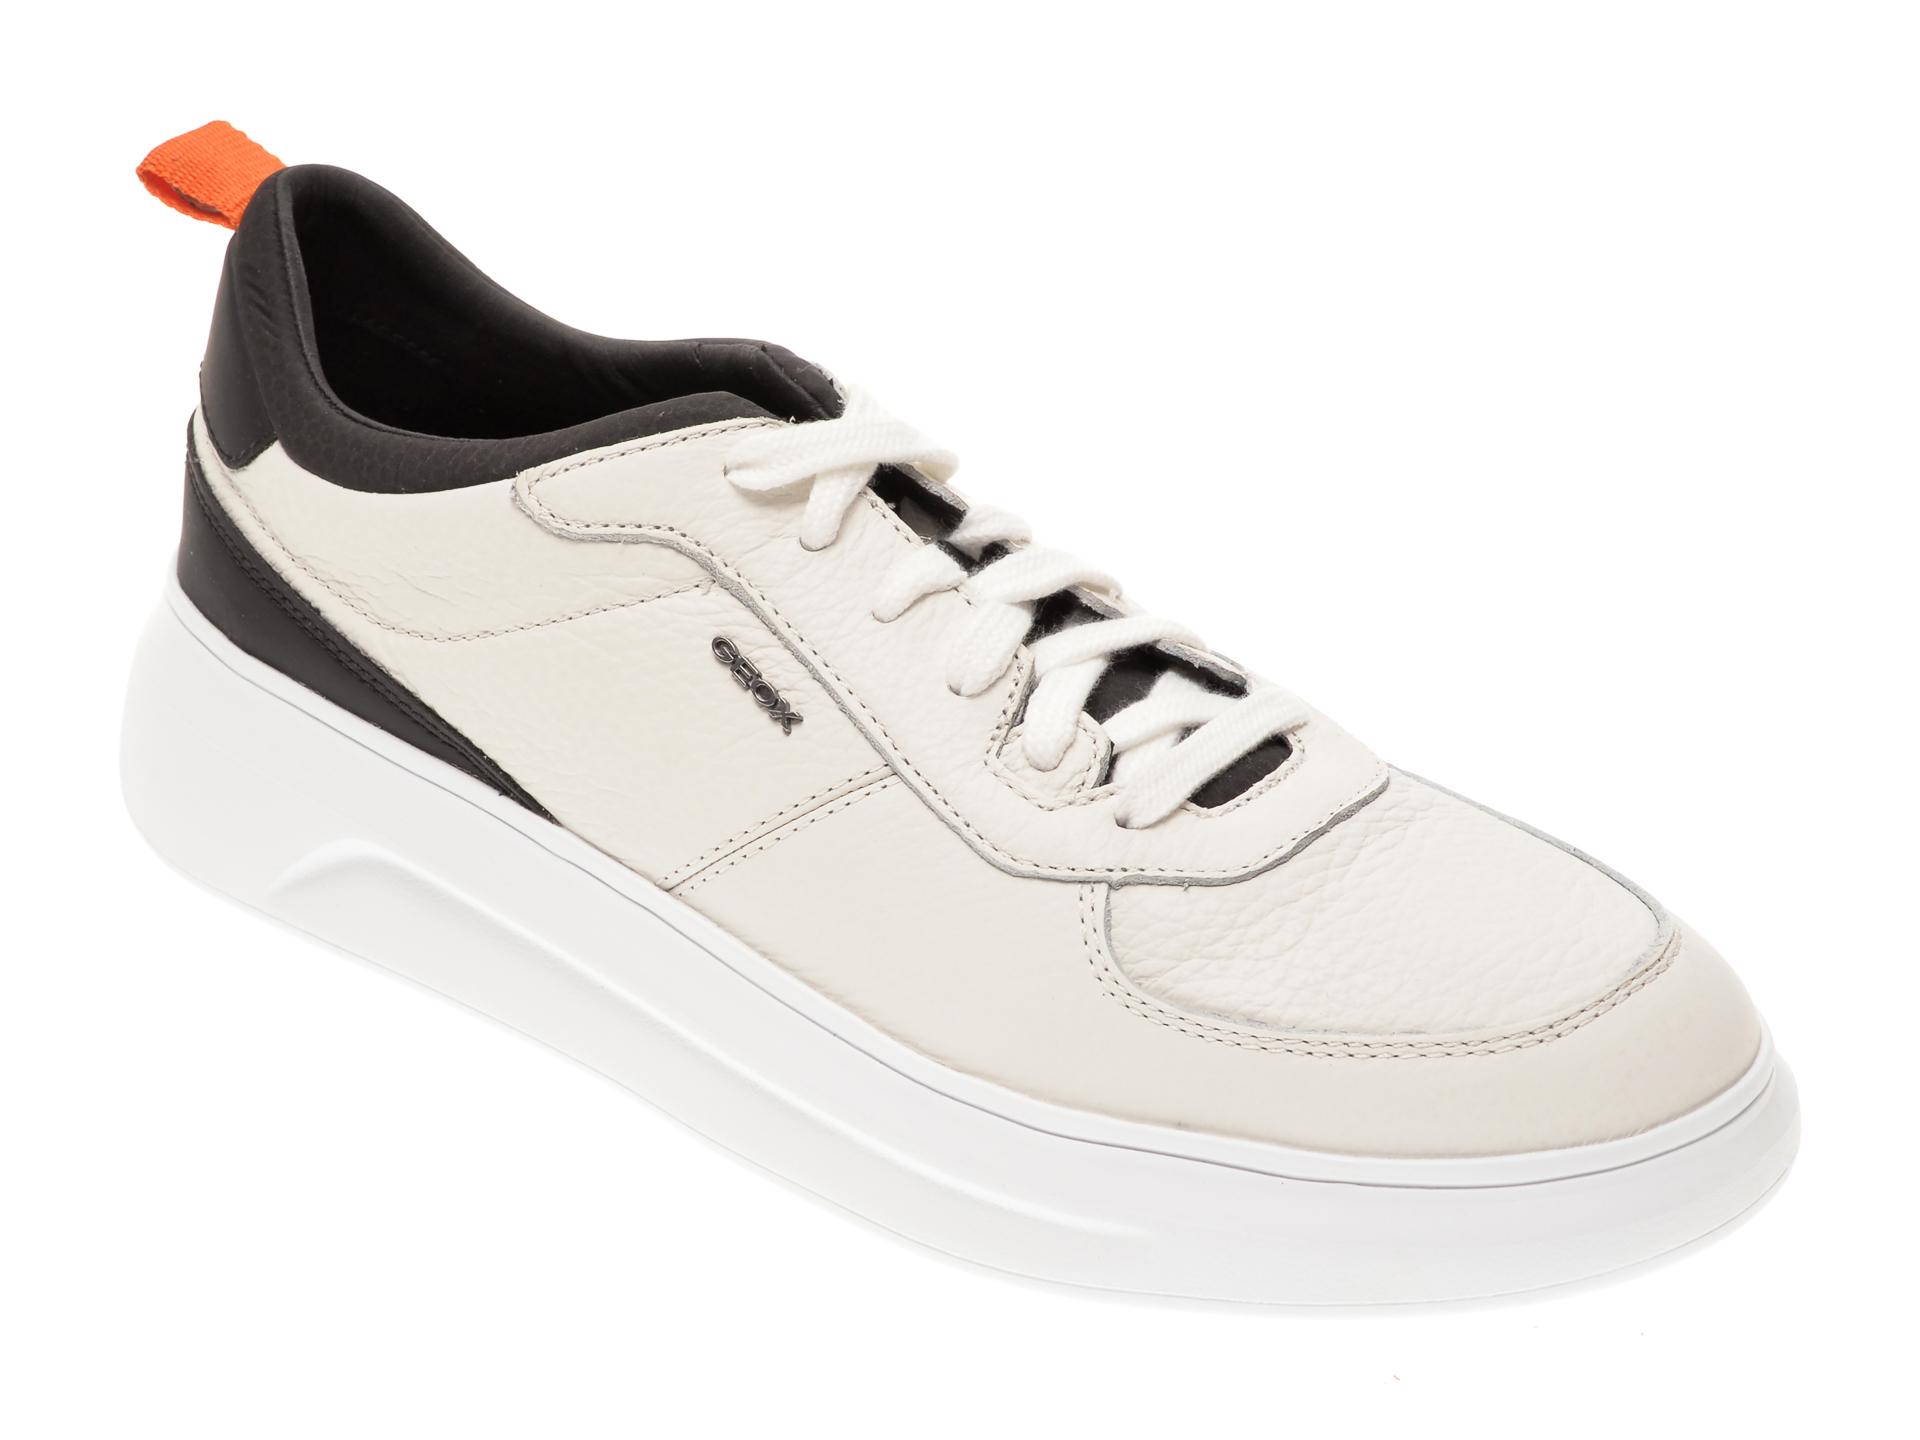 Pantofi sport GEOX alb-negru, U04ATE, din piele naturala imagine